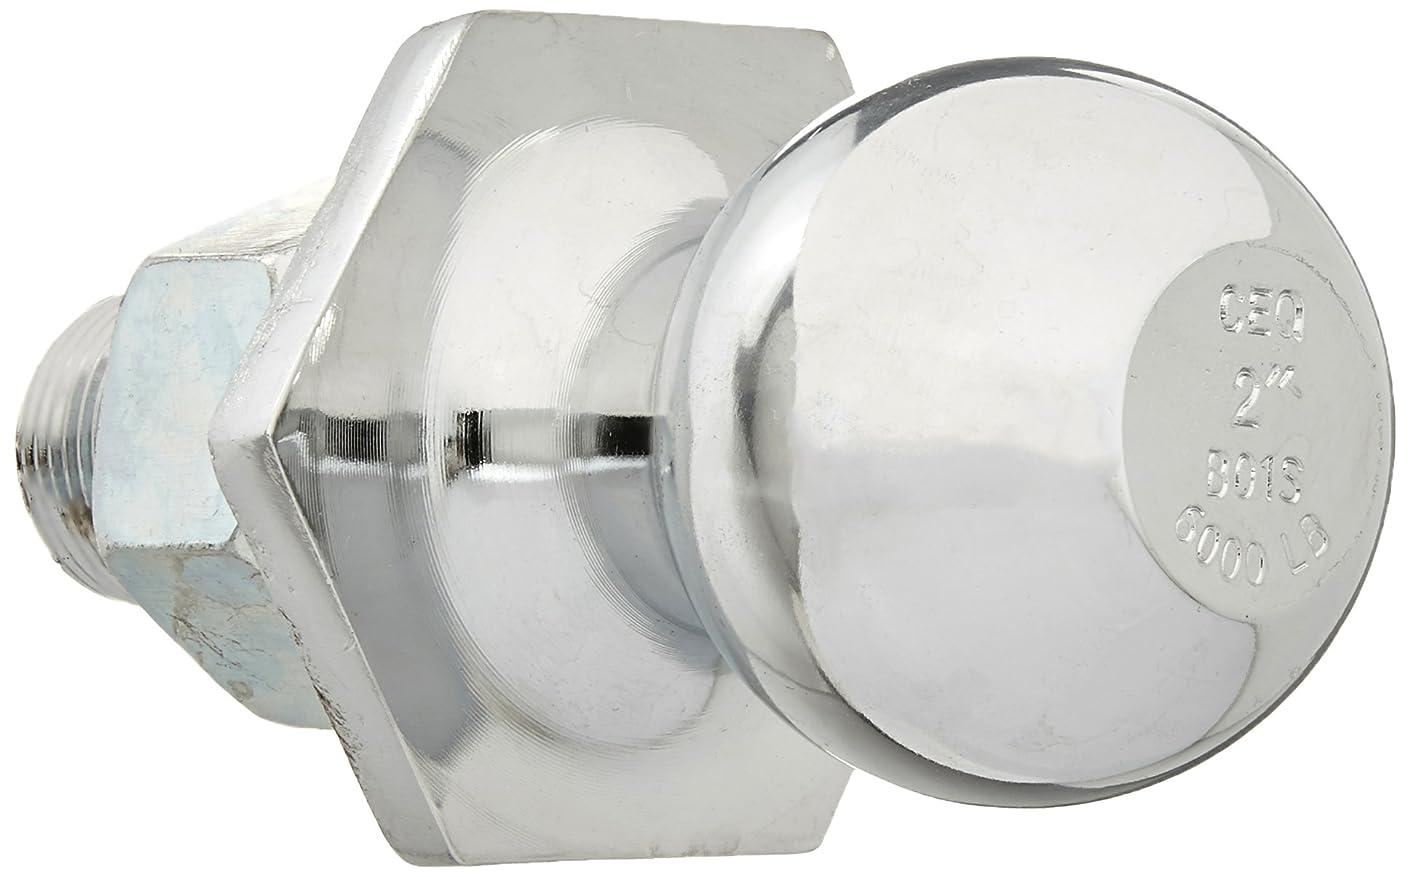 Reese Towpower 72803 Chrome Interlock 2